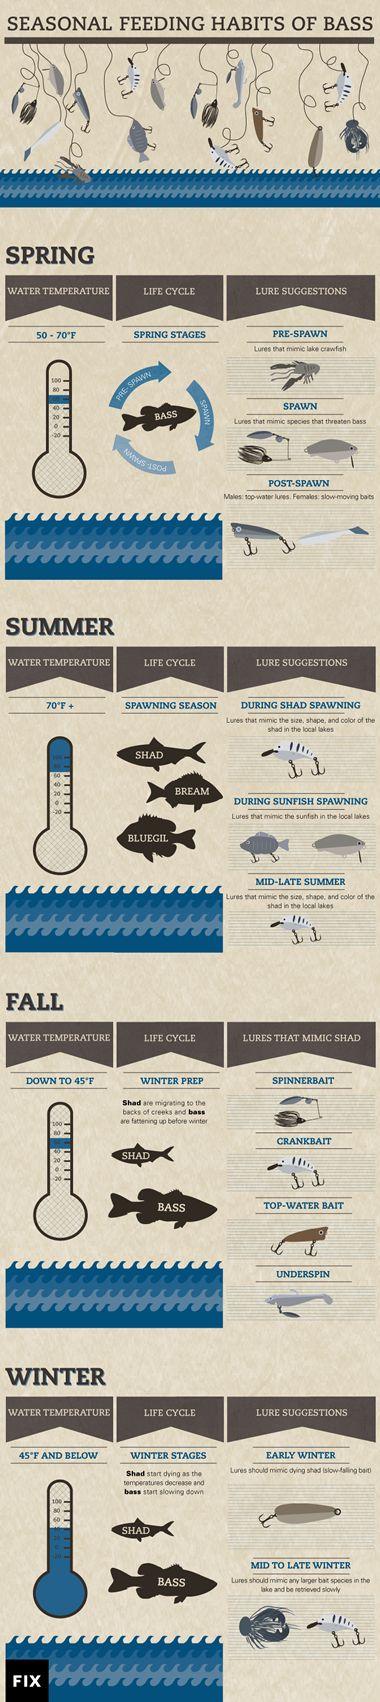 Bass Baiting by Season